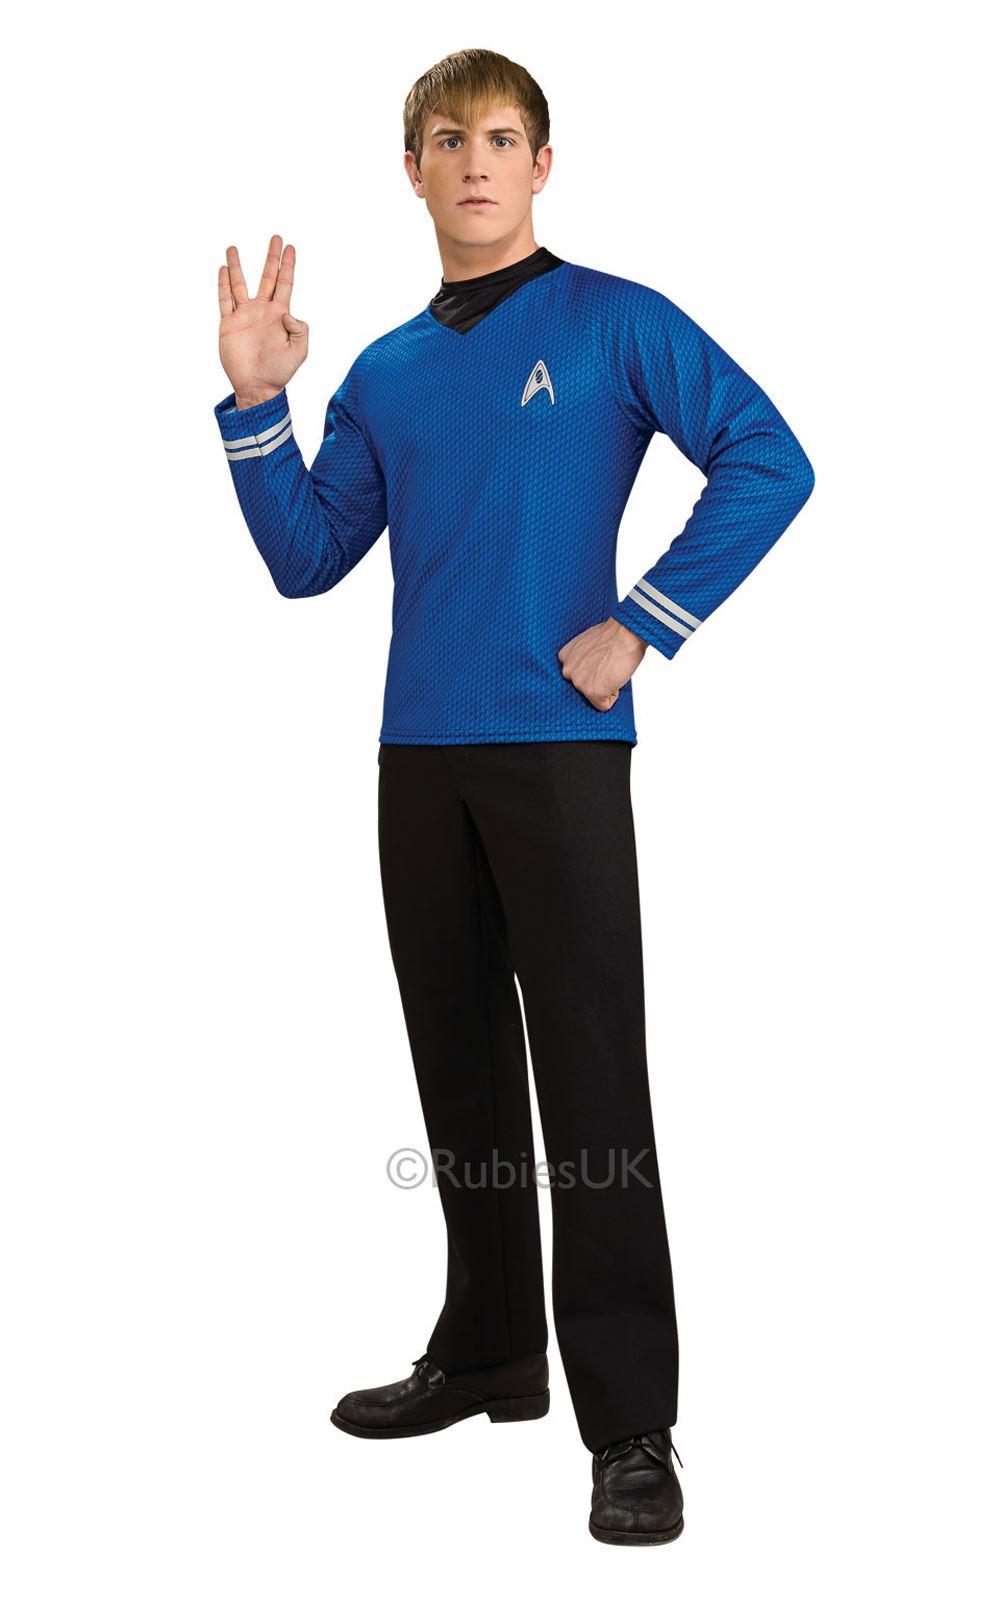 Adulto-DE-LUJO-Spock-Camisa-disfraz-para-hombre-Vulcano-Star-Trek-Sci-Fi-Disfraz